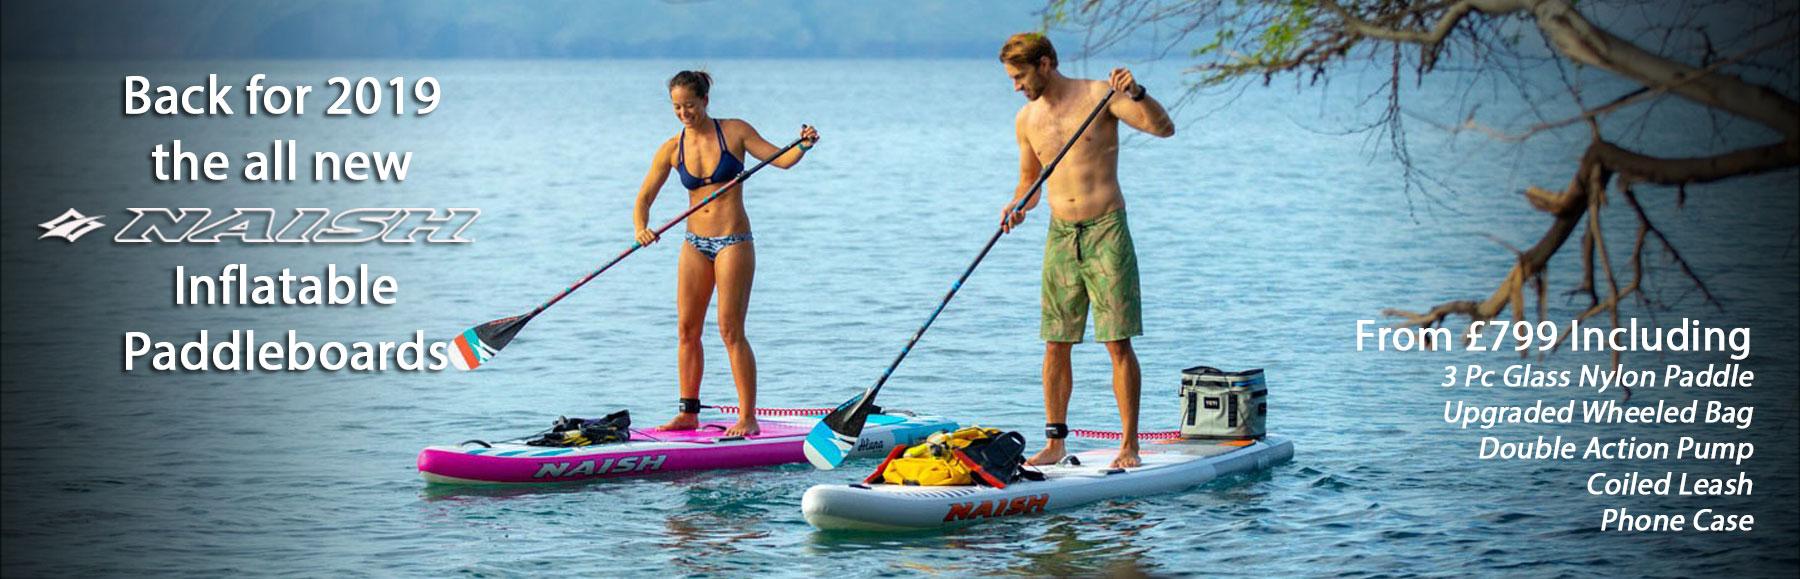 Naish Inflatable Paddle Boards 2019